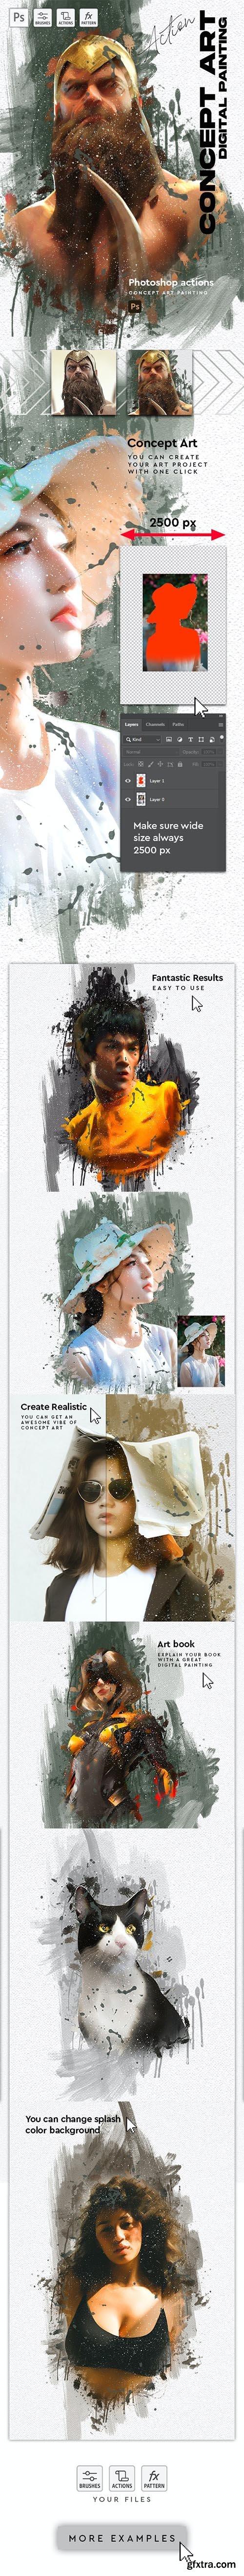 GraphicRiver - Concept Art - Digital Painting Photoshop Action 30363879